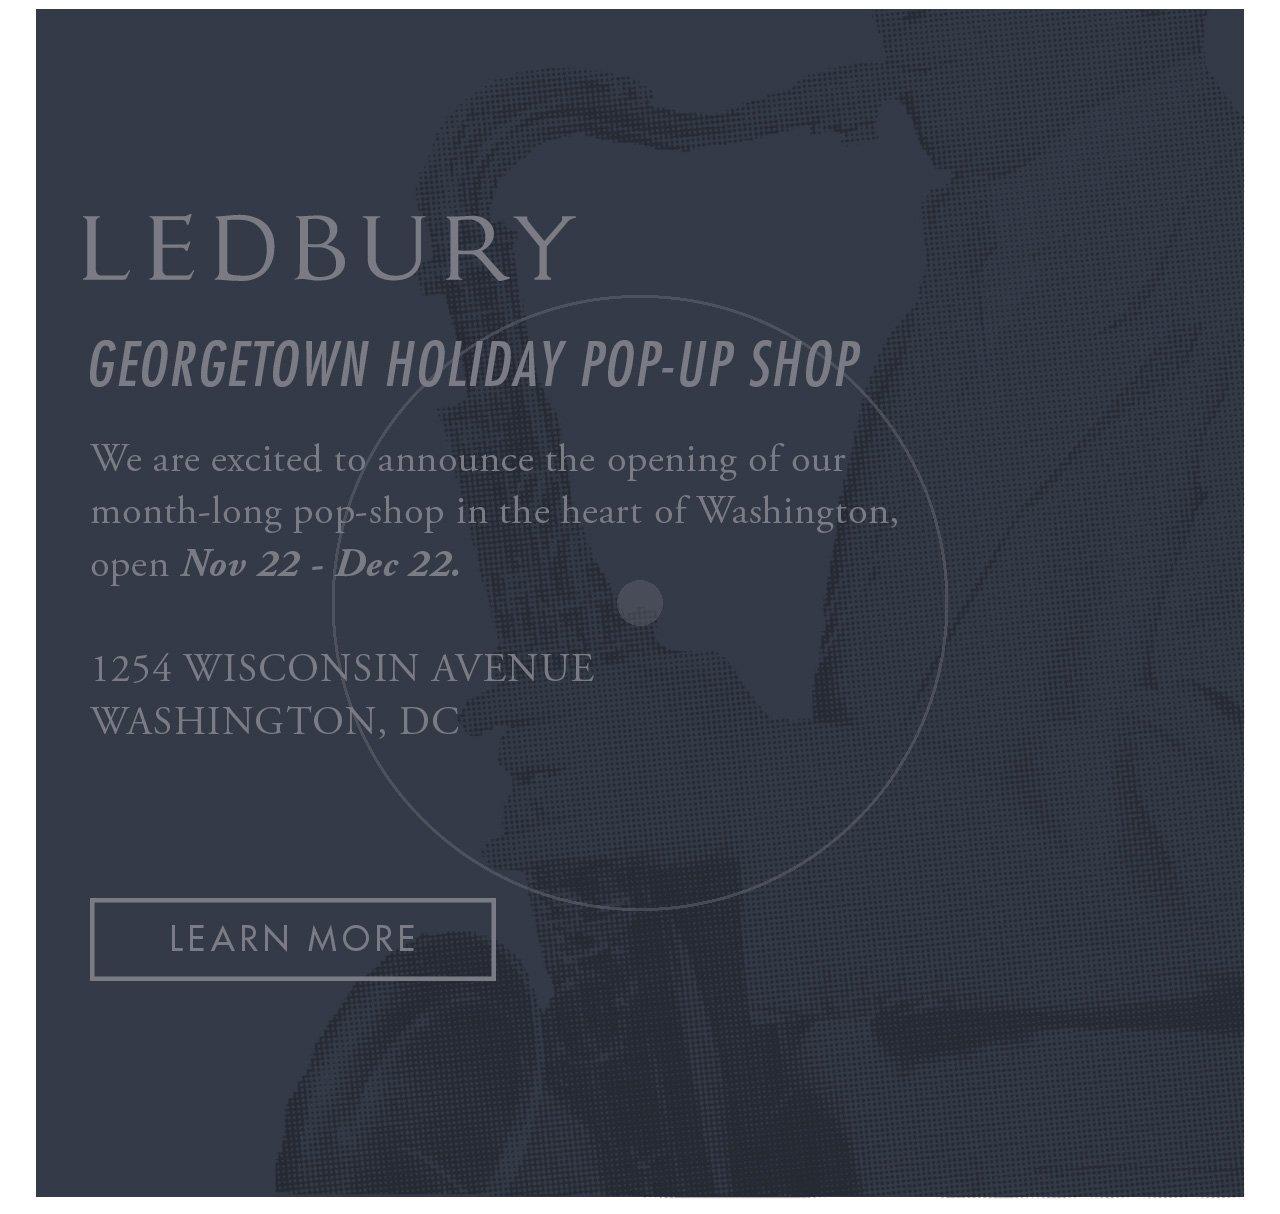 Georgetown Pop Up / Nov 22 - Dec 22